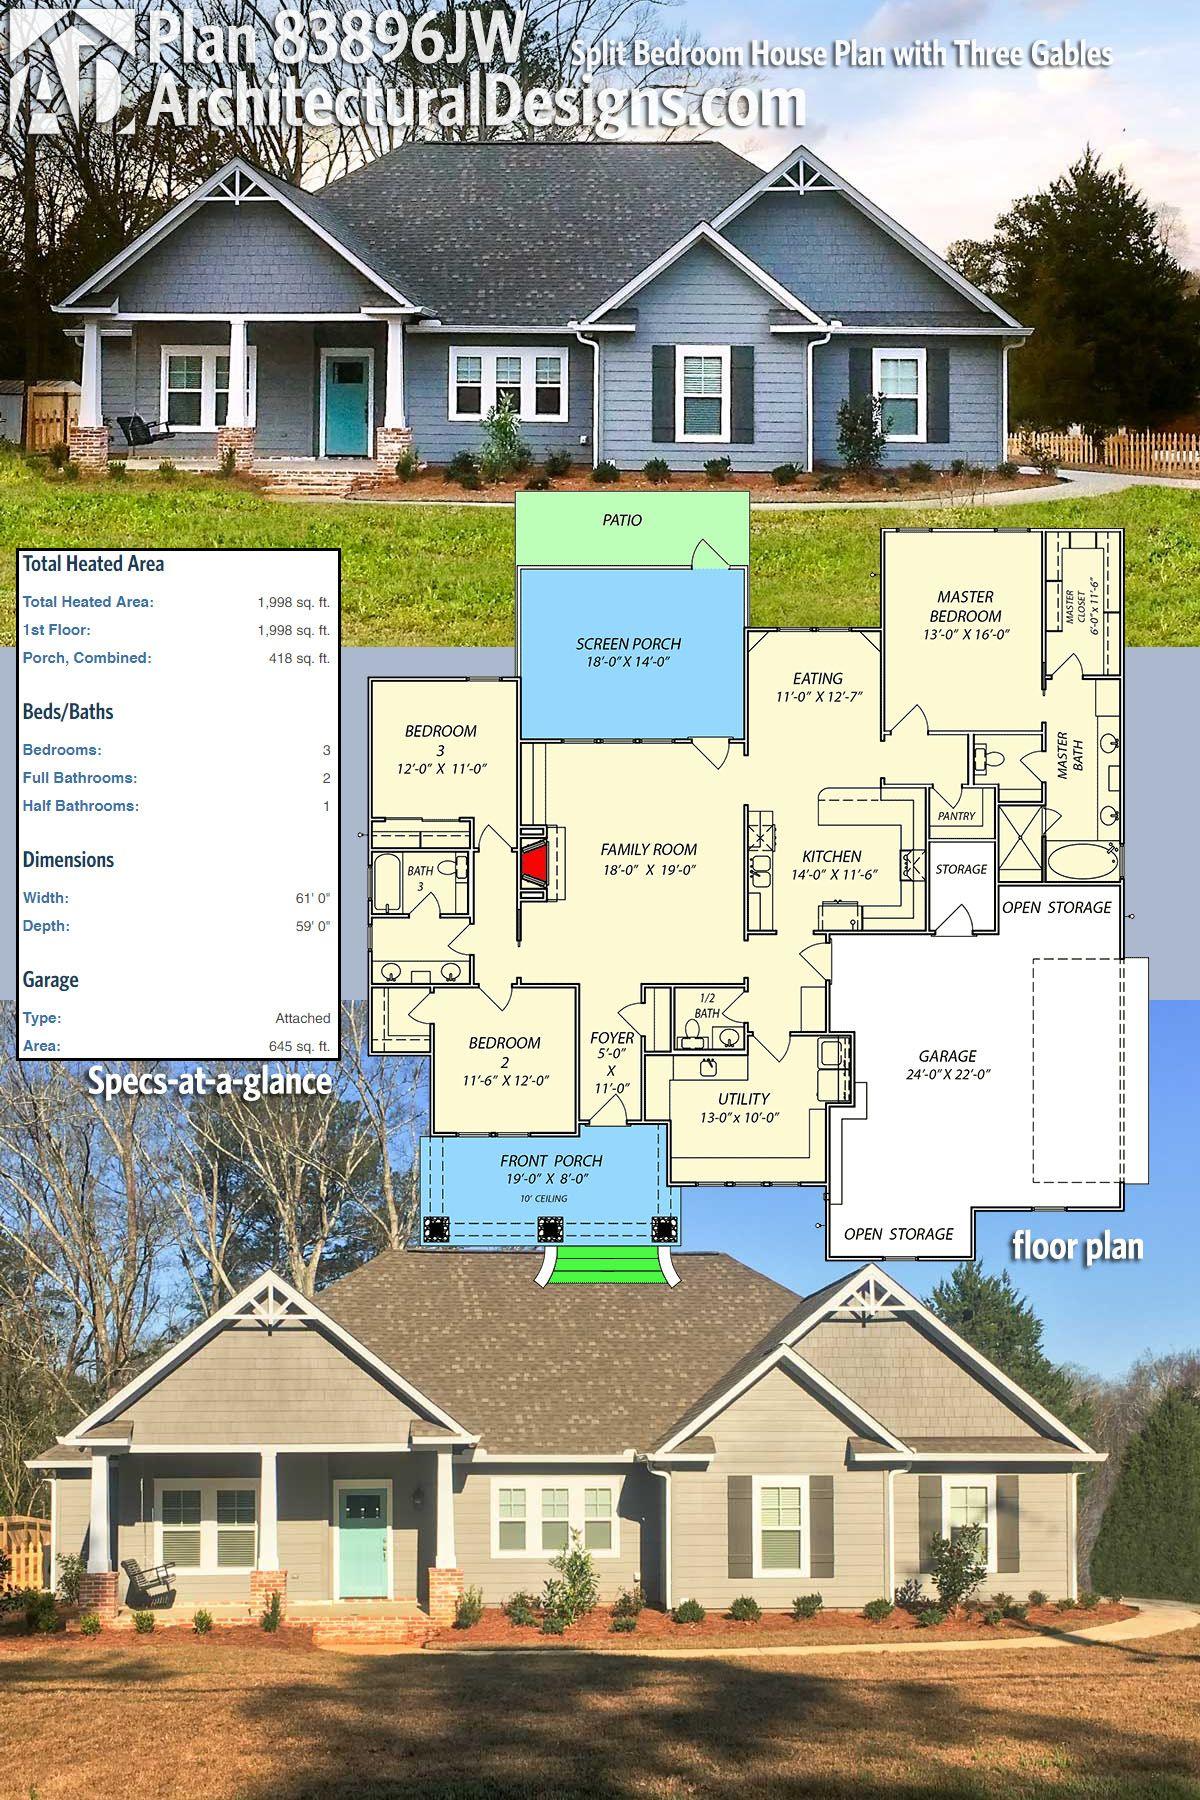 Plan 83896jw Split Bedroom House Plan With Three Gables House Plans Small House Plans Storage Building Plans